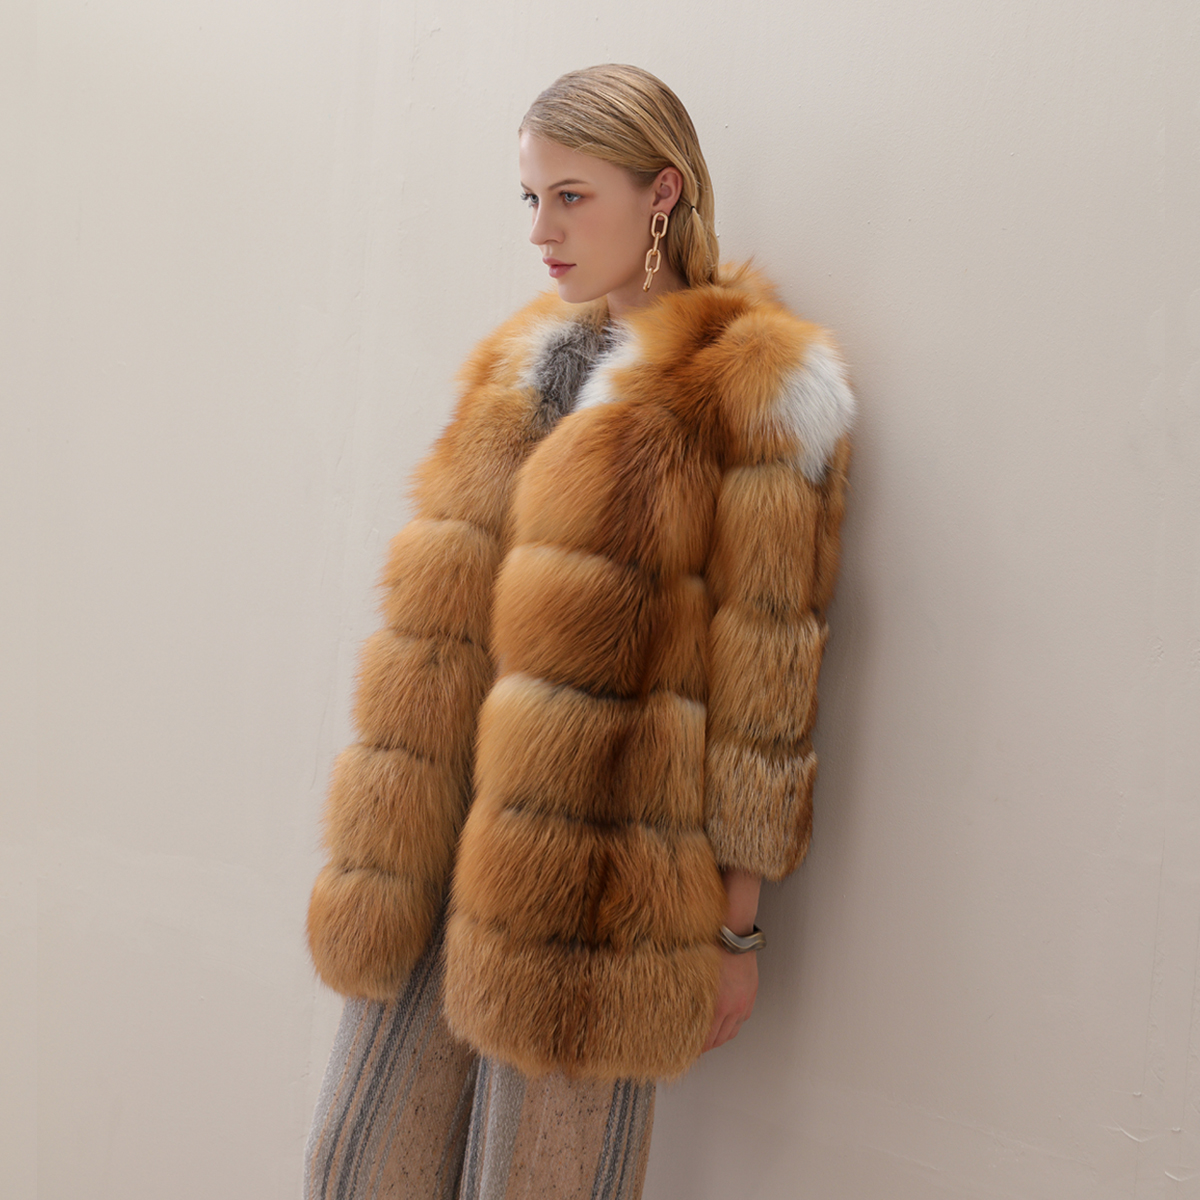 Qiu dong fox fur import long fox fur coat sleeve of the nine